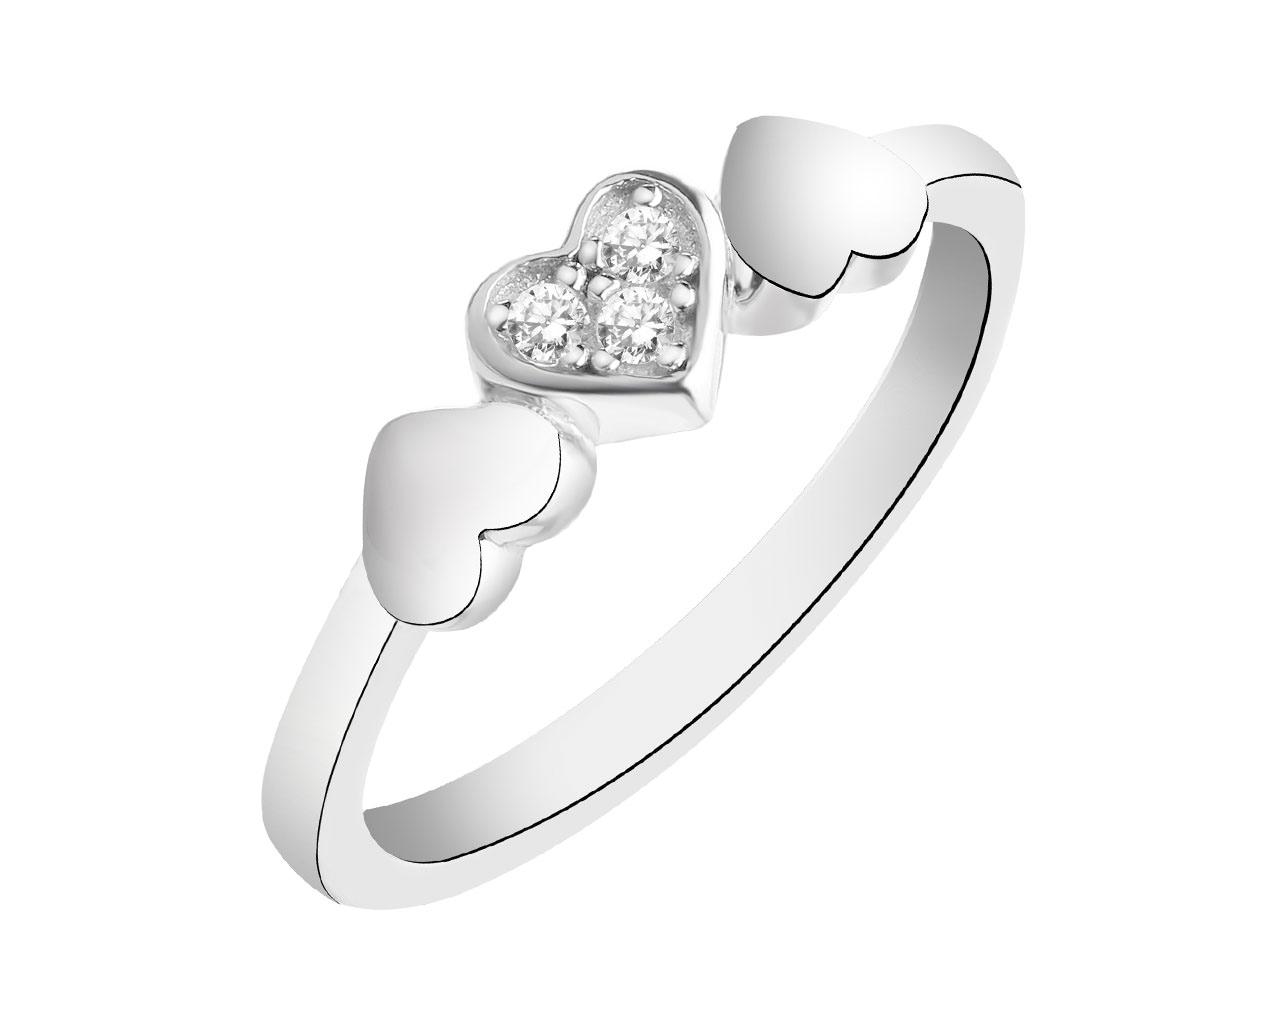 30b7deff520c67 Biżuteria, biżuteria online / Apart / Apart